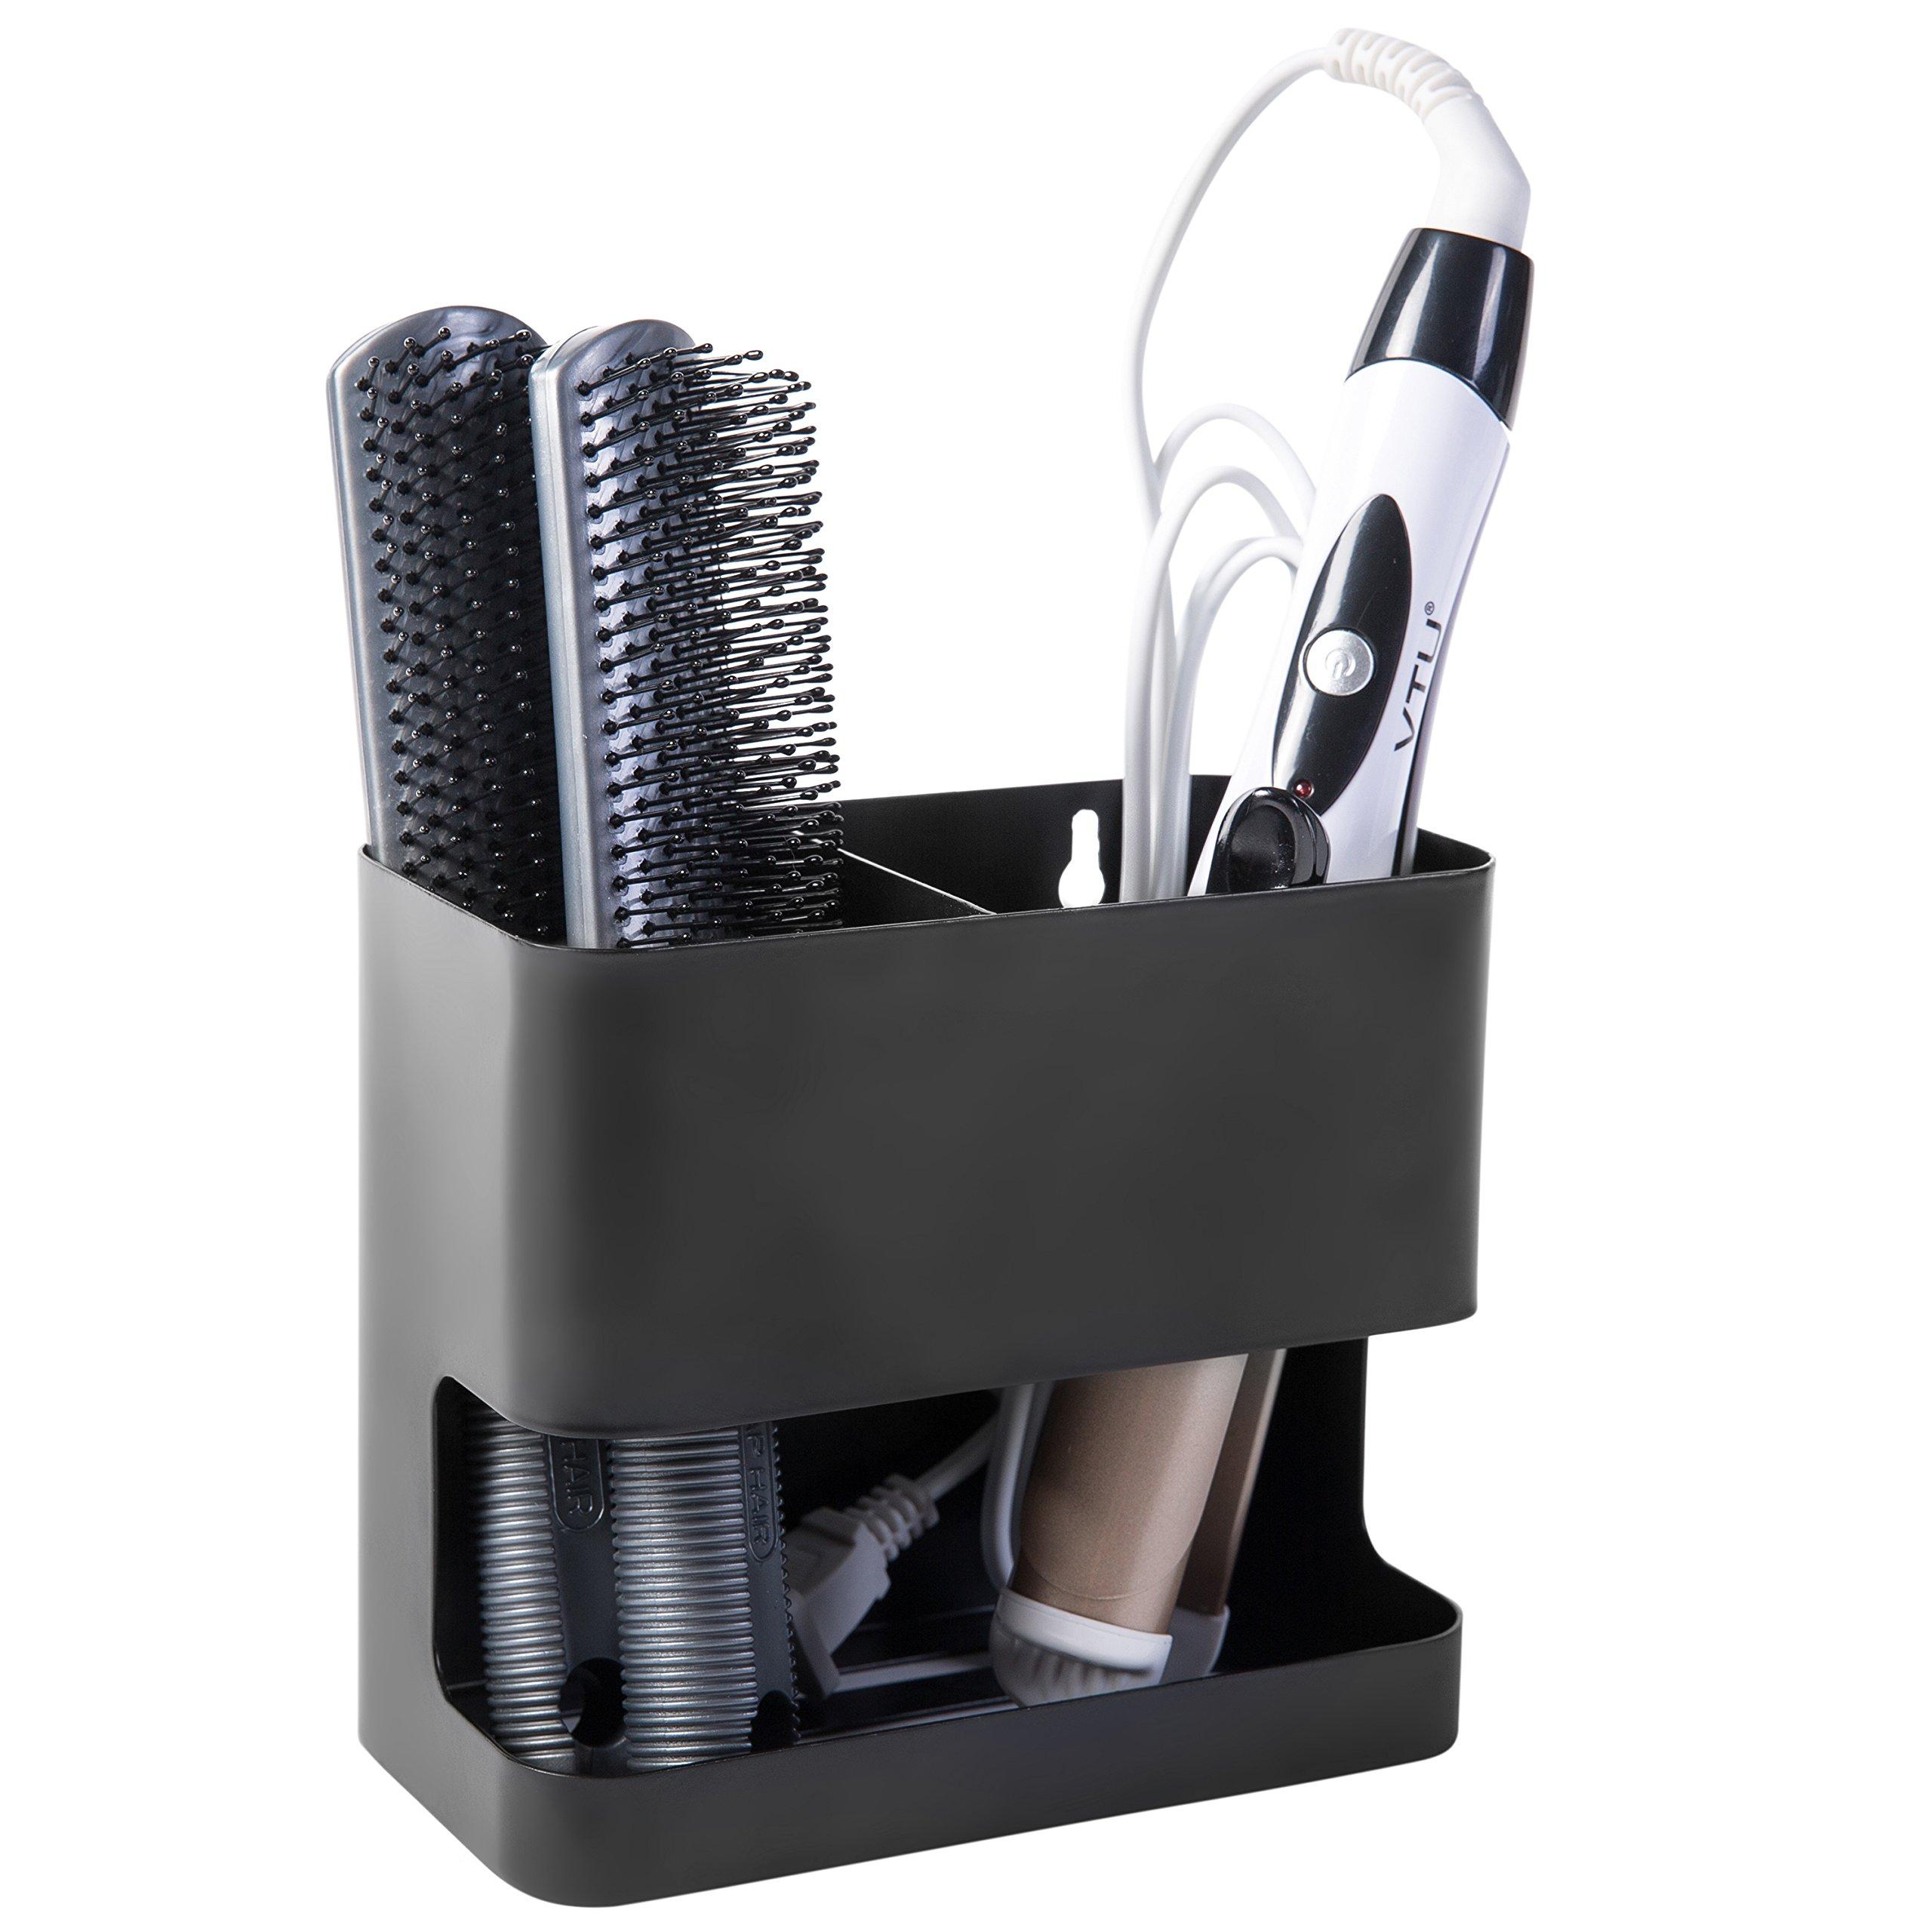 MyGift 2 Slot Black Metal Wall Mountable Hair Tool Accessories Organizer Rack, Blow Dryer & Curling Iron Holder